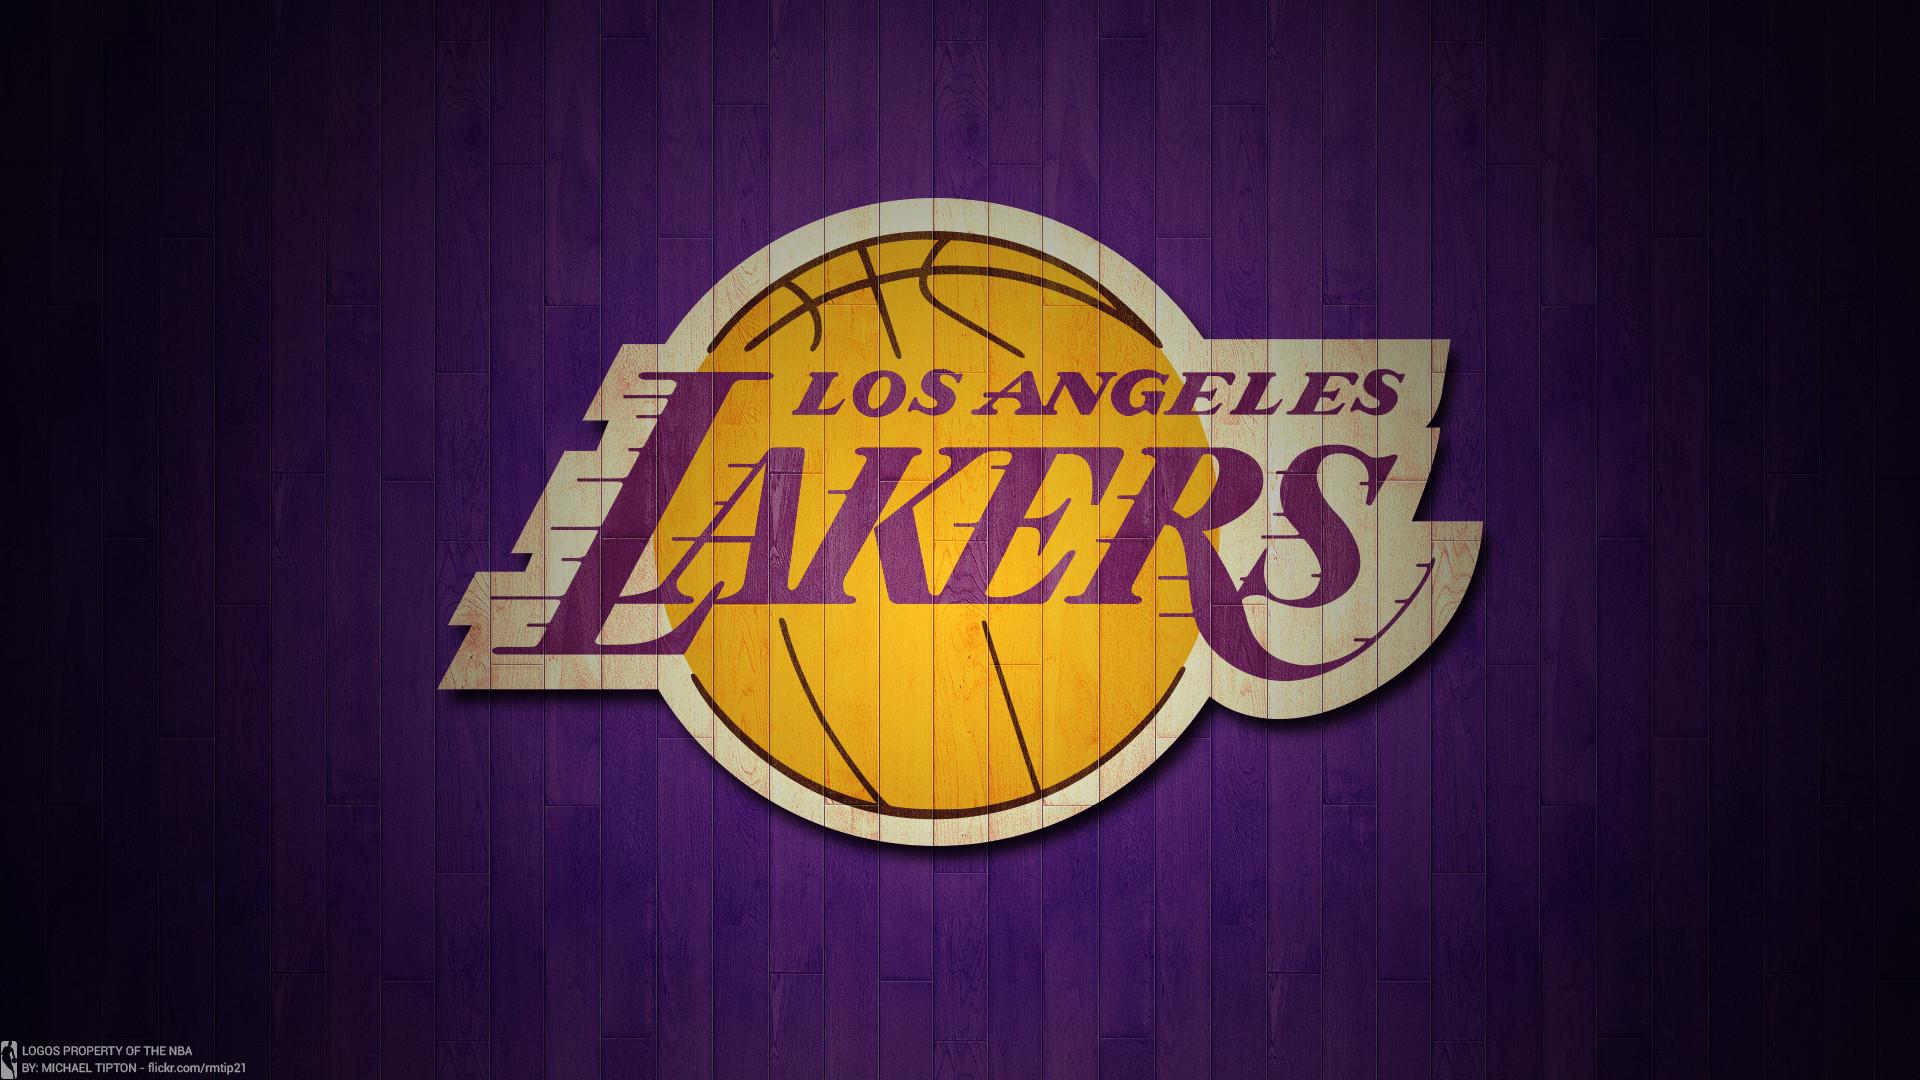 Lakers Rumors: Julius Randle To Nuggets, Gary Harris To LA?